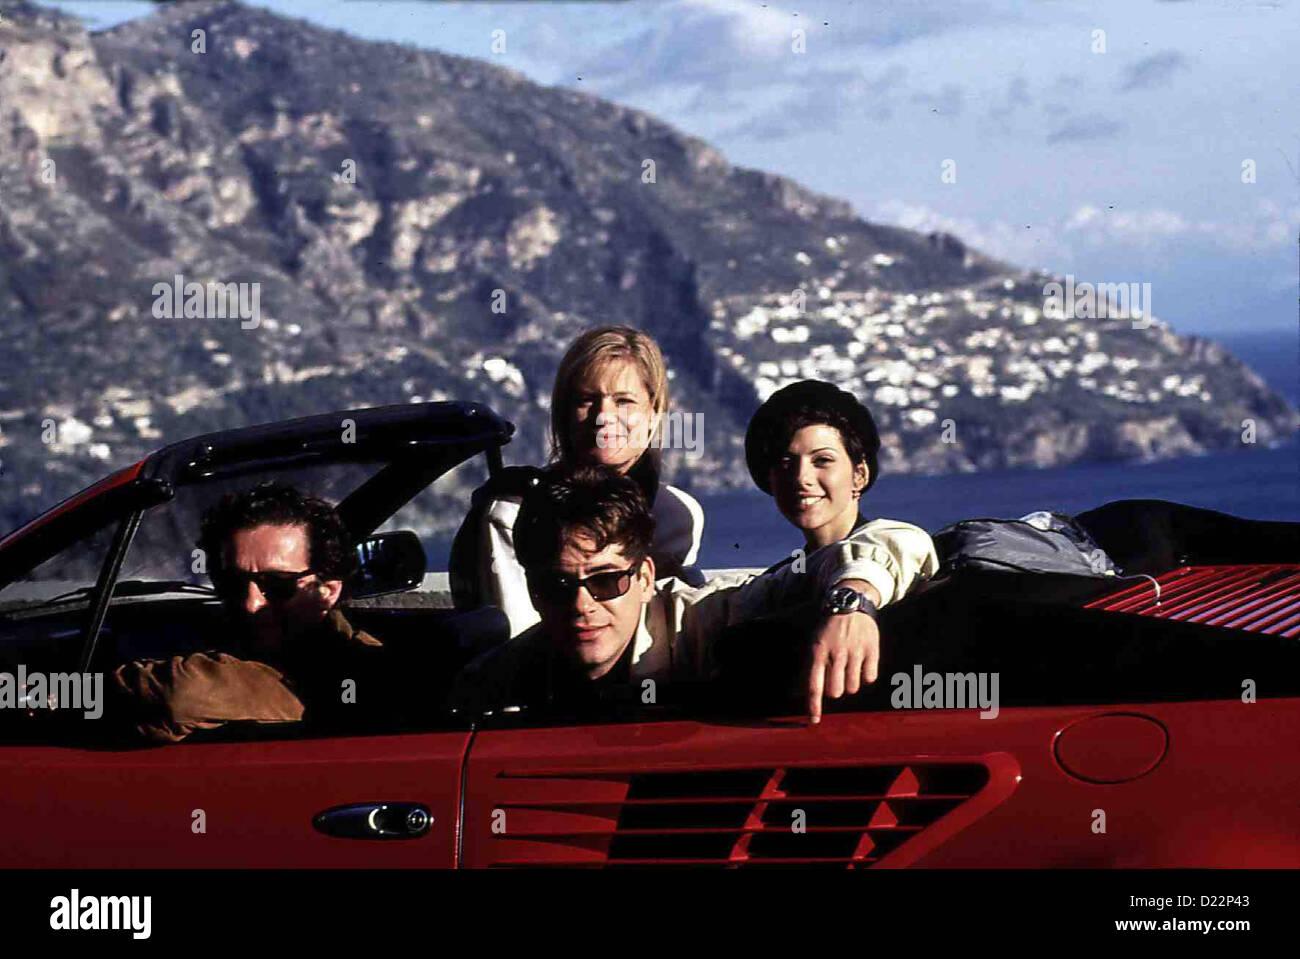 Nur Fuer Dich - Only You  Only You  Joaquim de Almeida, Bonnie Hunt, Robert Downey Jr., Marisa Tomei Gemeinsam mit - Stock Image